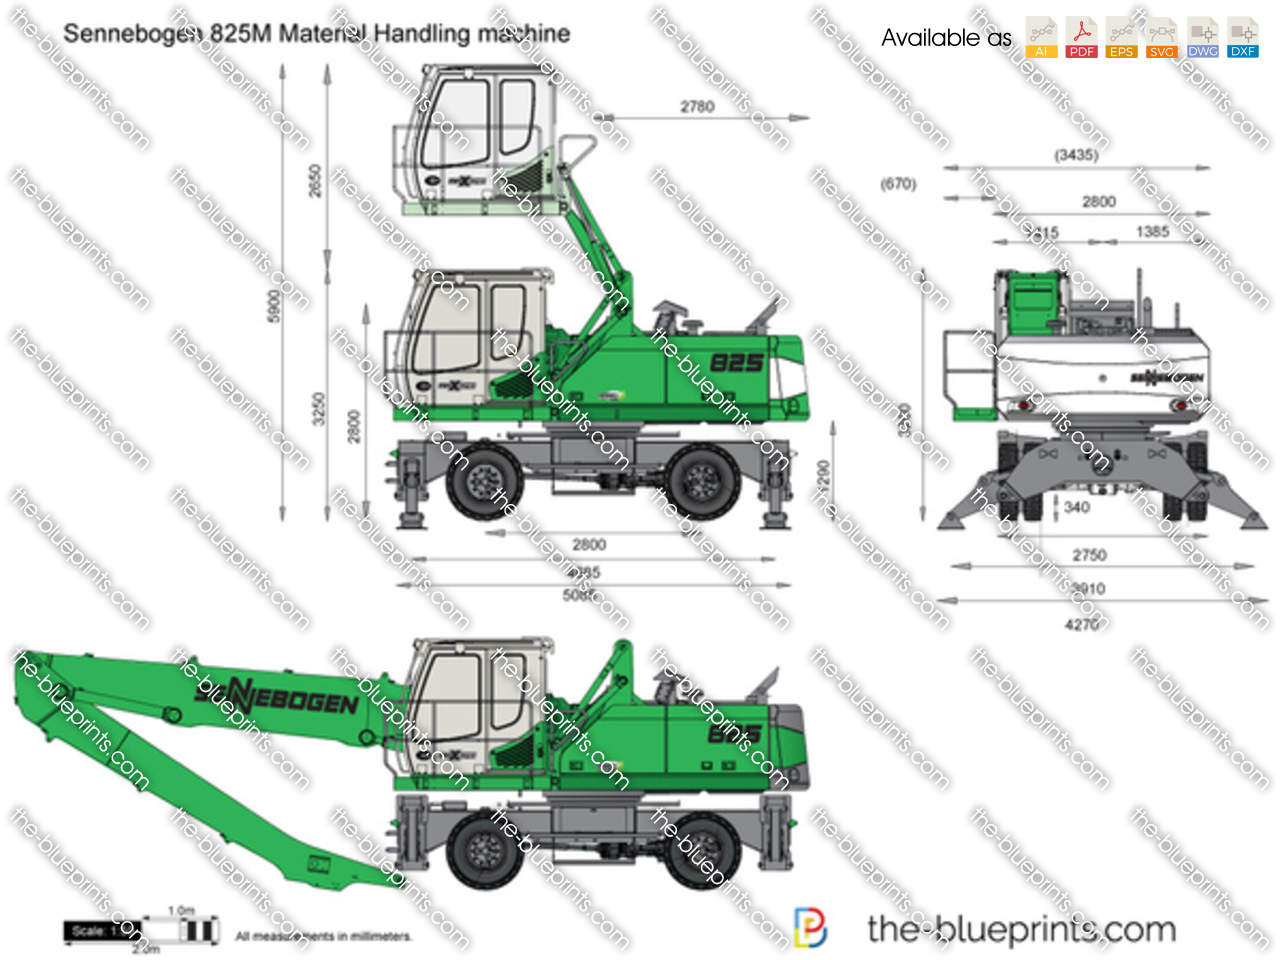 Sennebogen 825M Material Handling machine